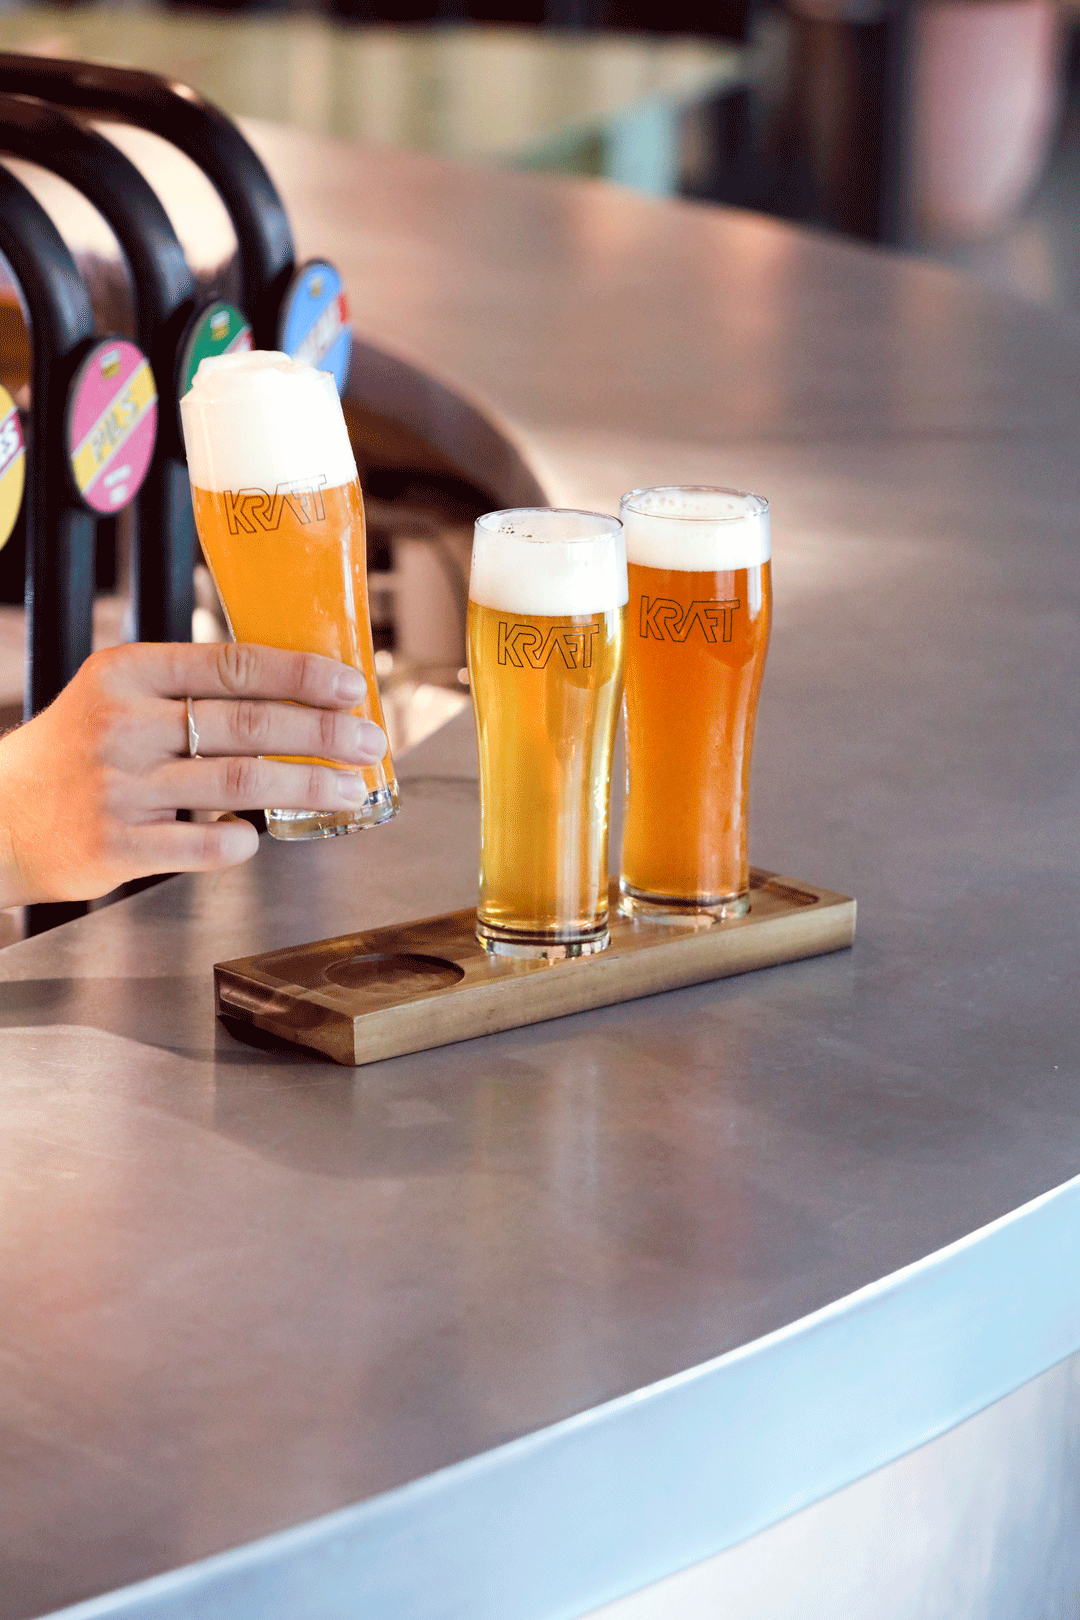 german-kraft-dalston-beer-tasting-flight-london-shoreditch-craft-brewery